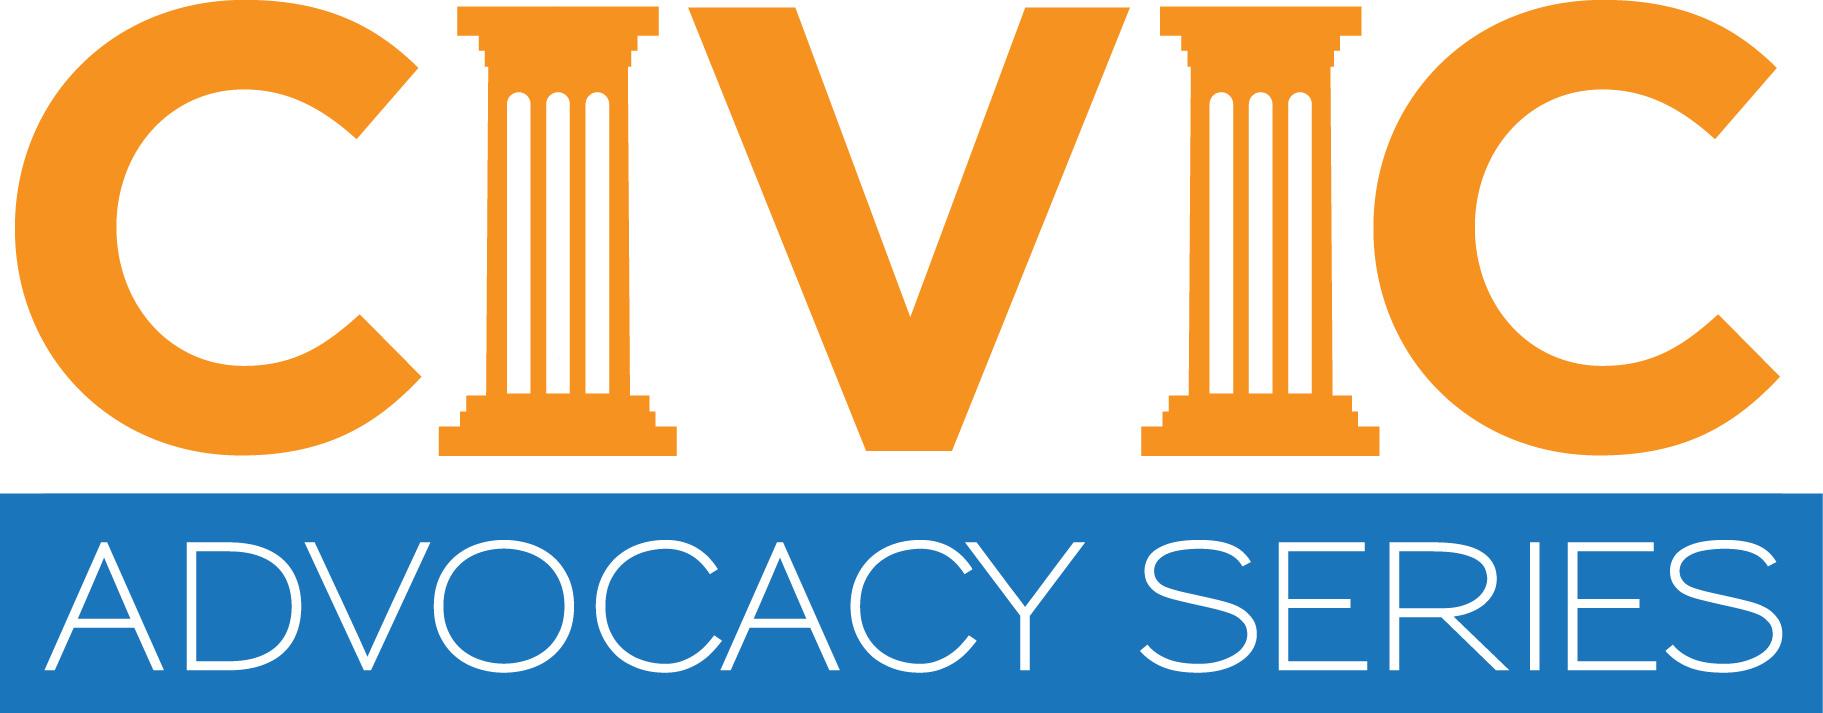 civic_advocacy_logo_finalRGB